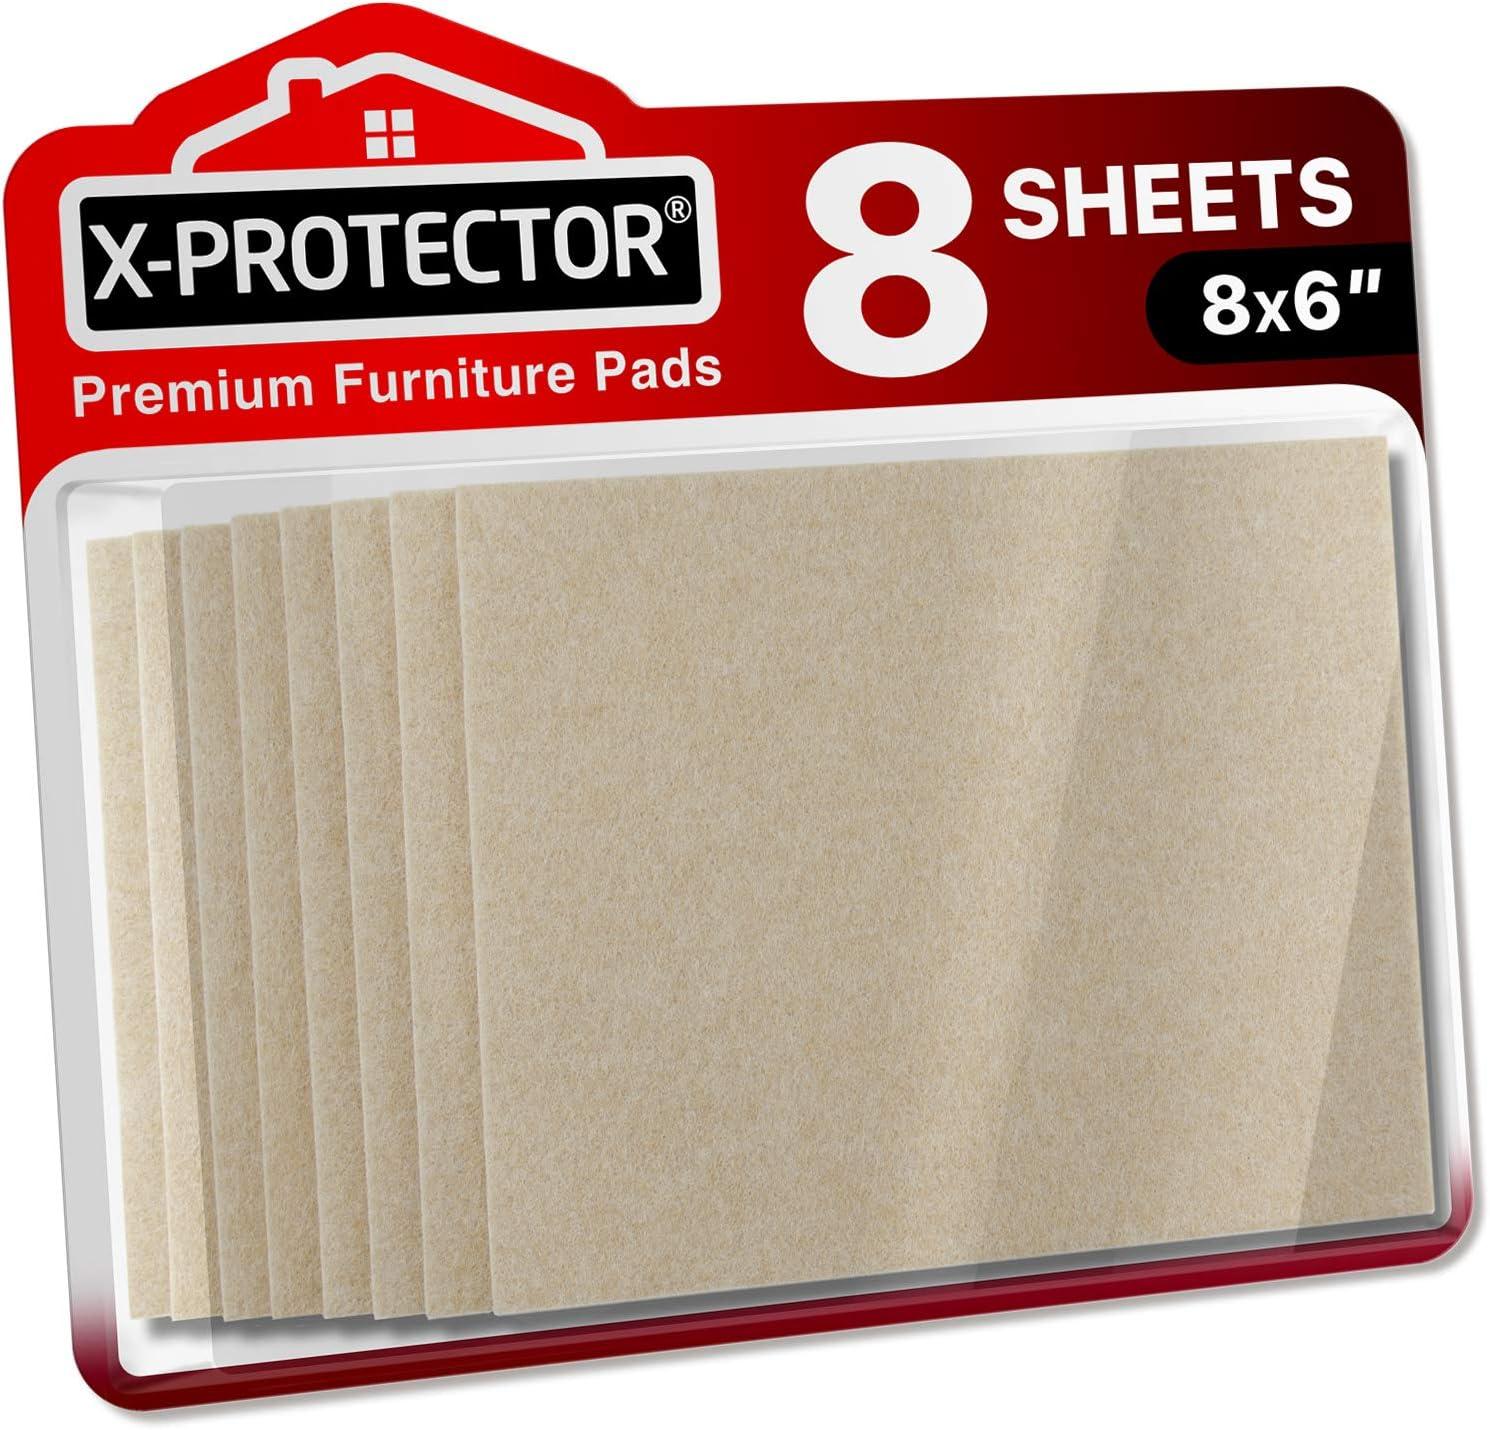 "X-PROTECTOR 8 Pack Premium Felt Pads Furniture 8""x6"" Max 55% OFF H Rapid rise"